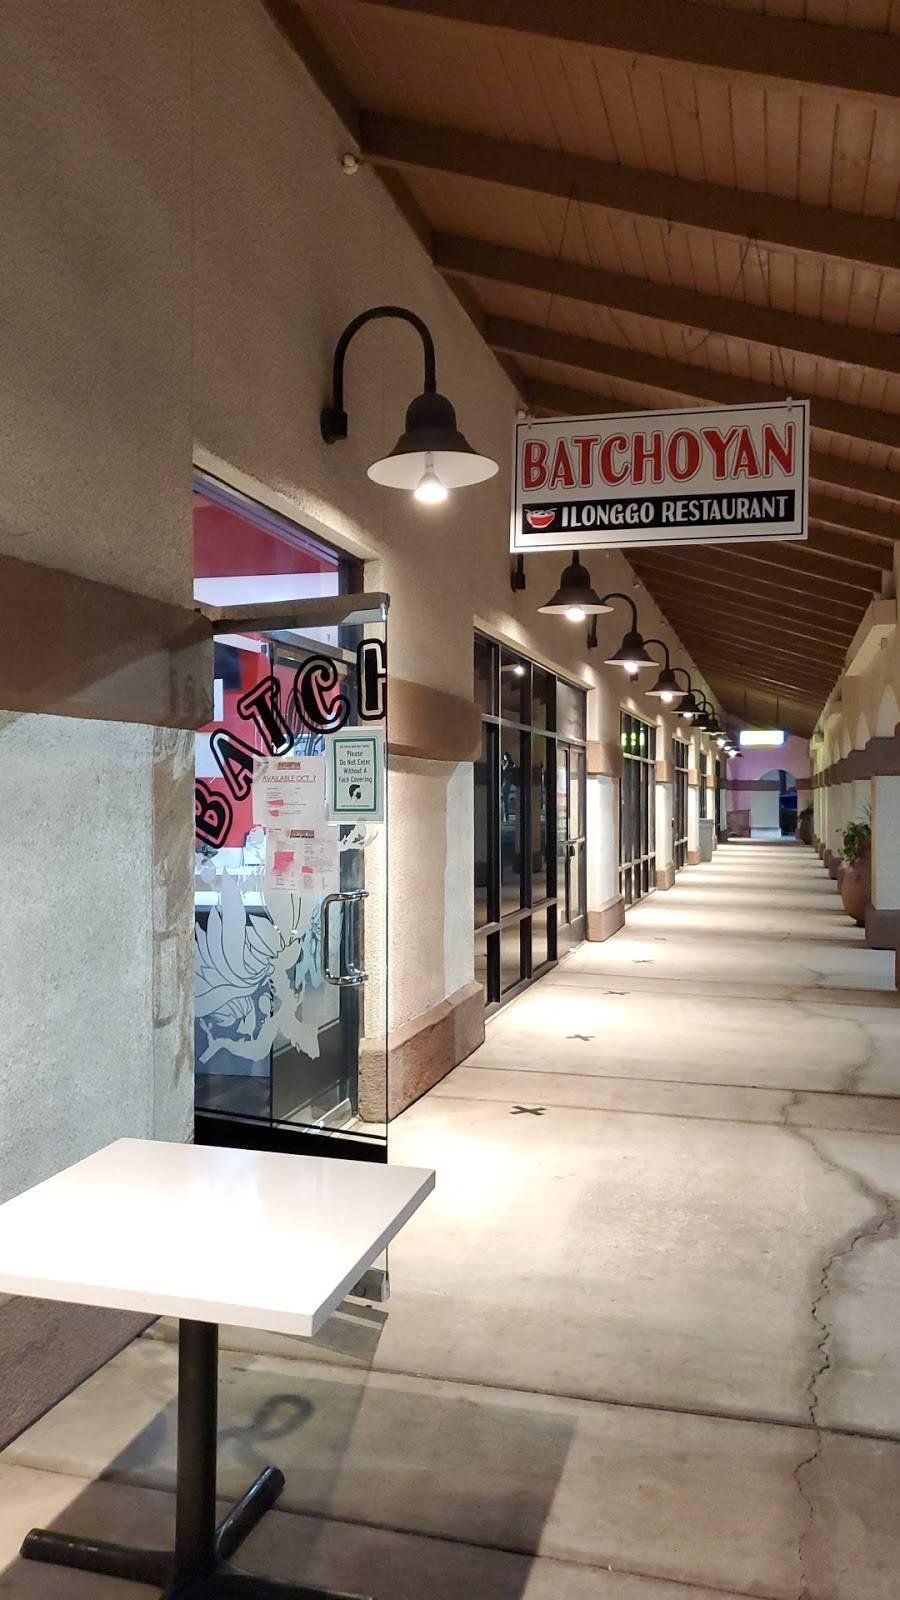 Batchoyan Ilonggo Restaurant | restaurant | 1775 E Daily Dr, Camarillo, CA 93010, USA | 8057024025 OR +1 805-702-4025